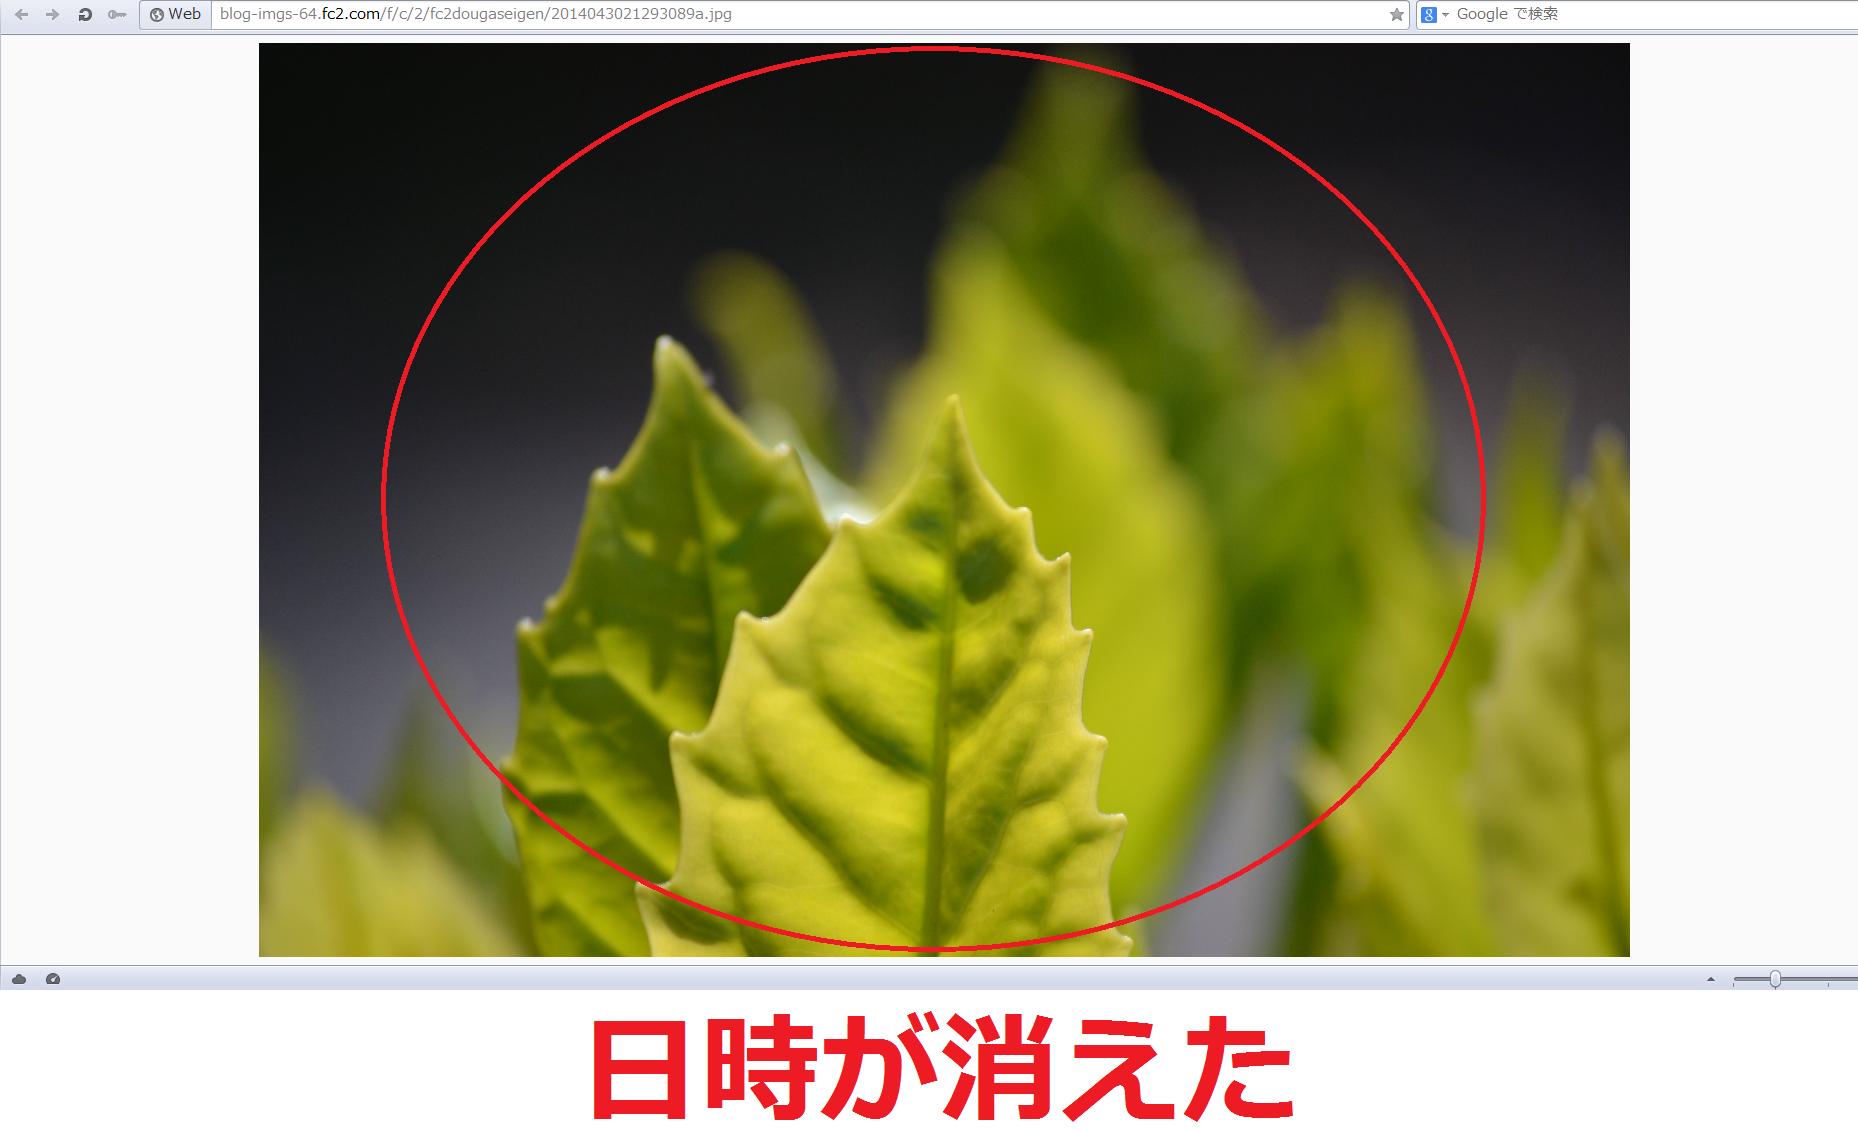 FC2ブログの写真の登録日時を非表示にする方法5